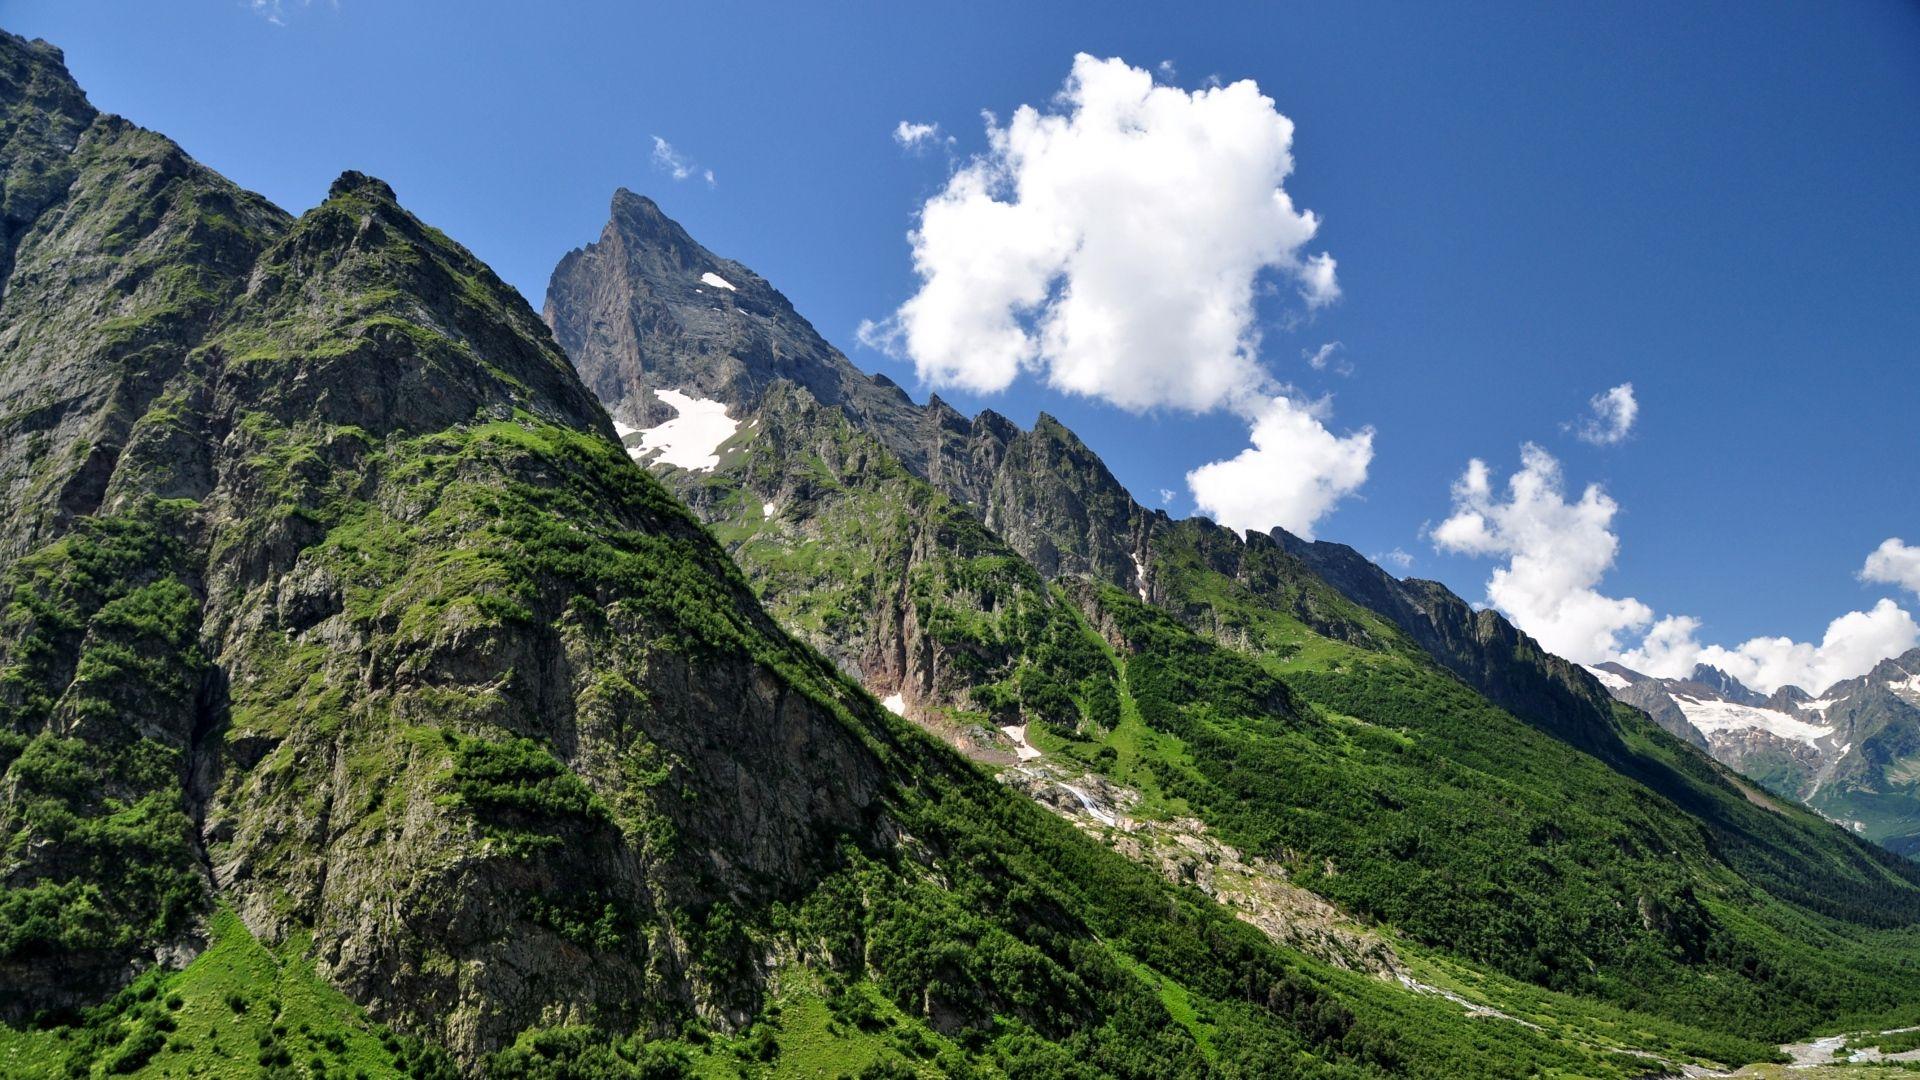 The Caucasus Mountains Wallpaper